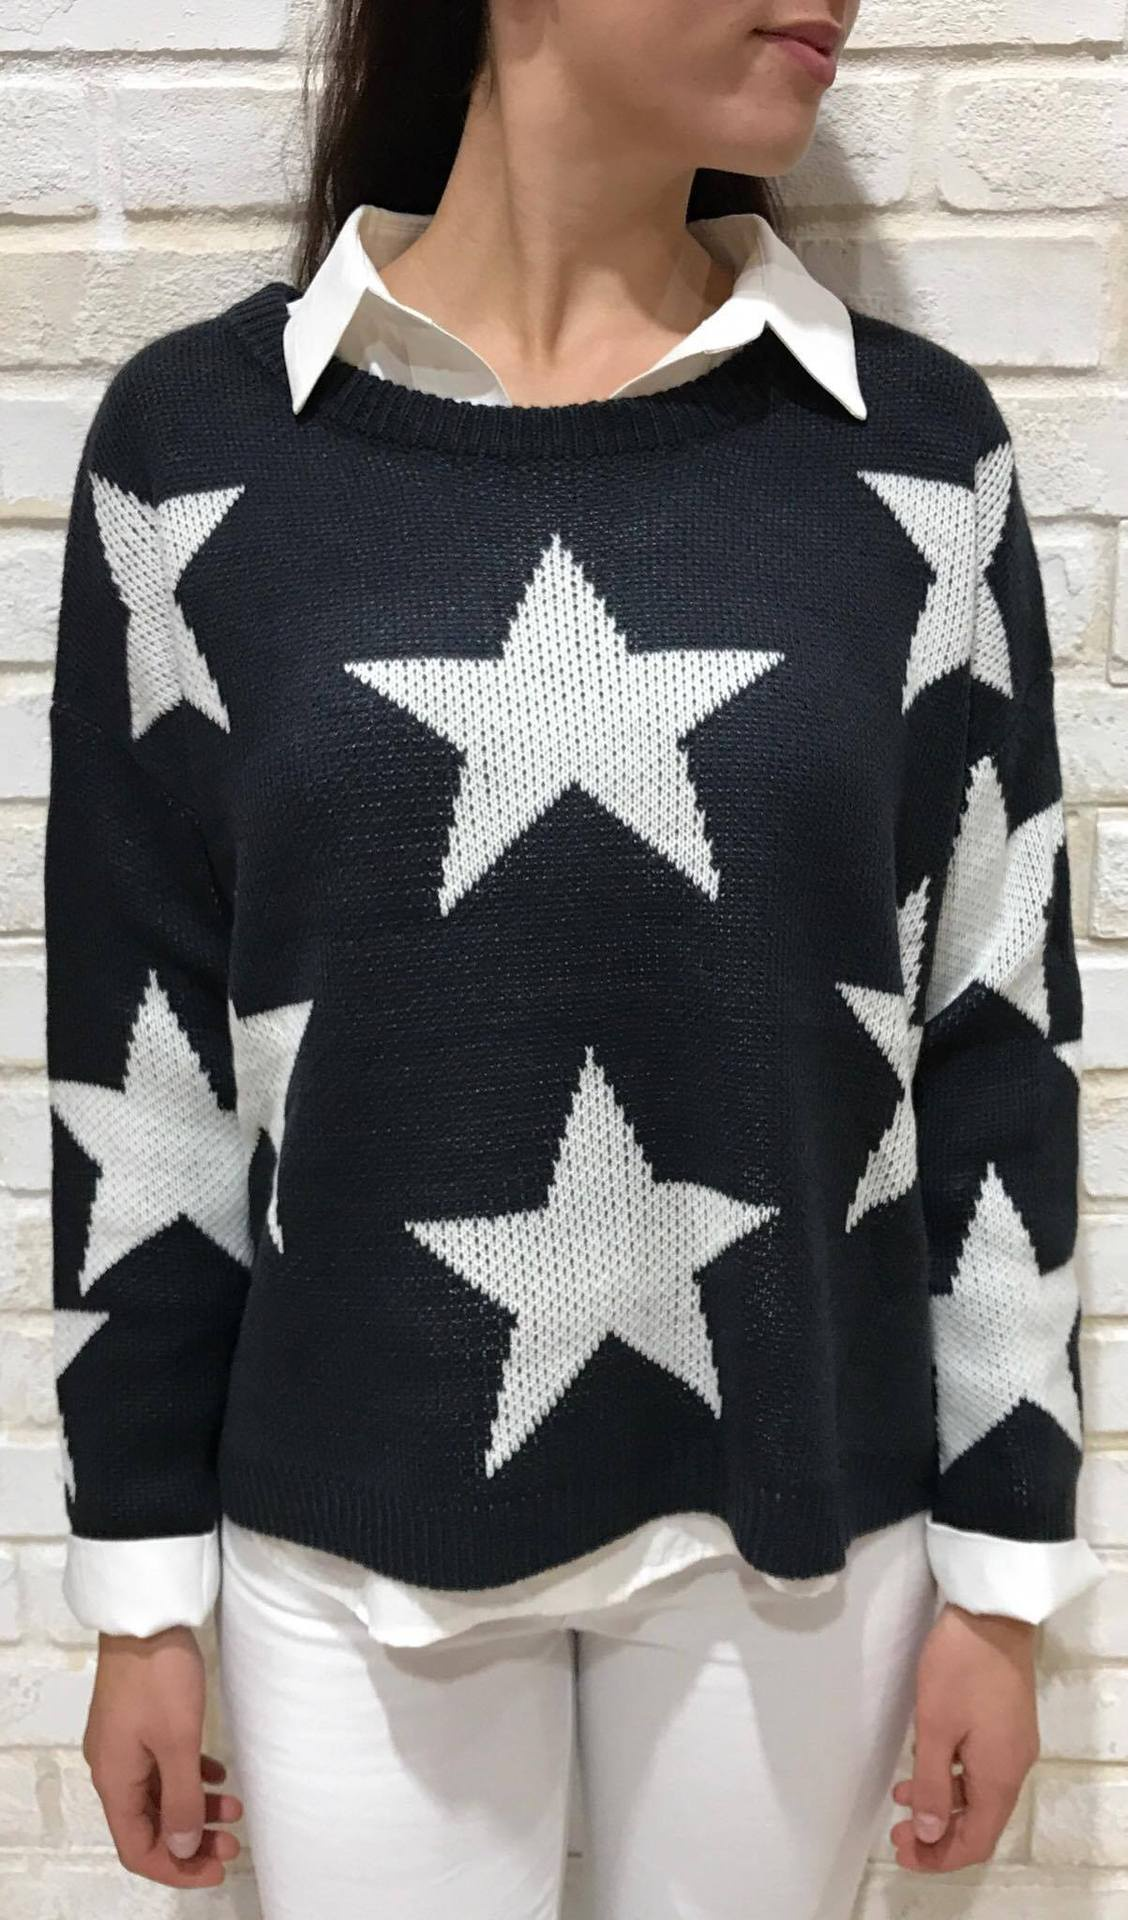 STAR KNIT / PH5073